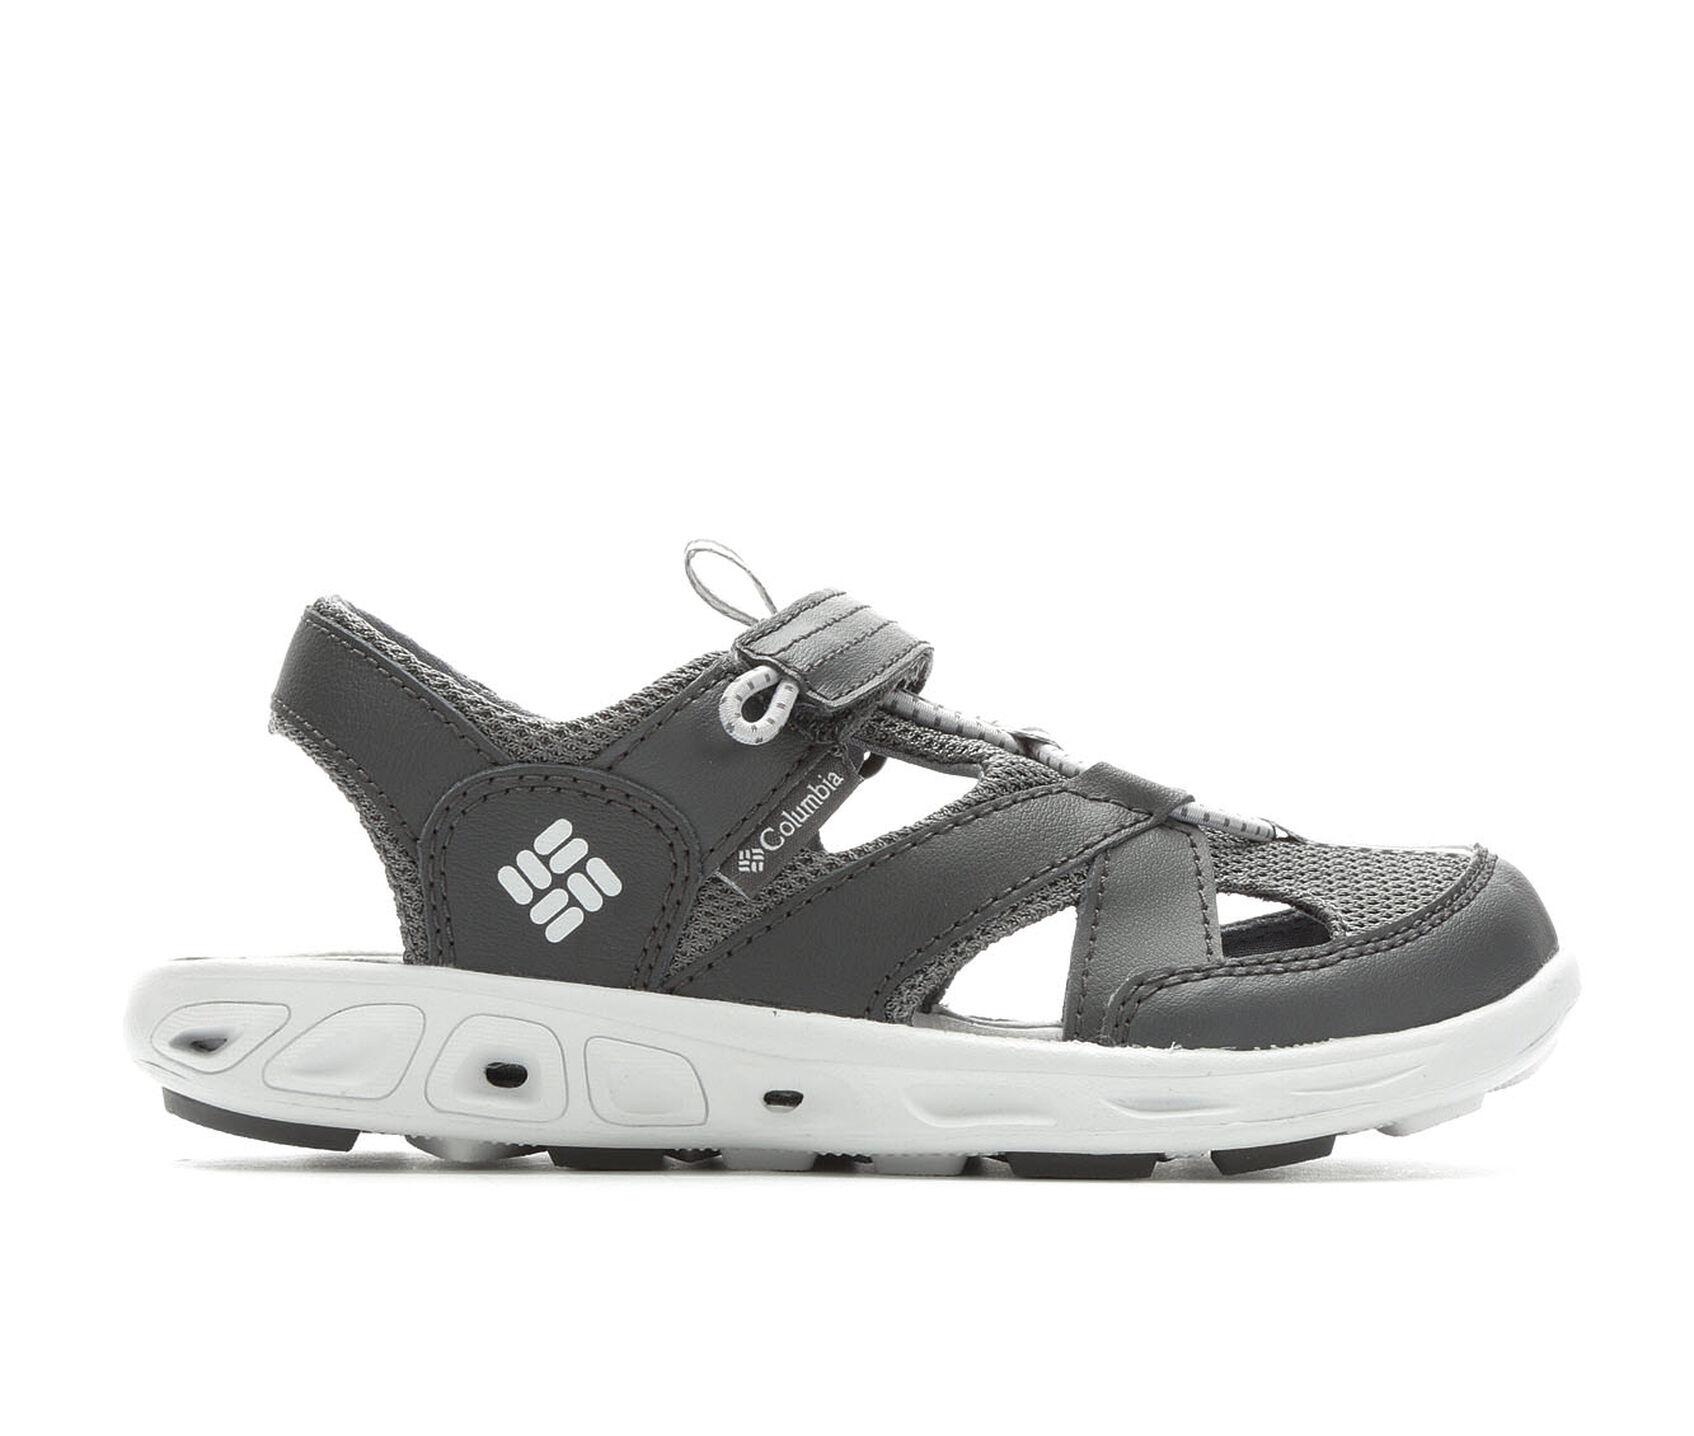 Boys Columbia Techsun Wave 1 7 Casual Shoes Shoe Carnival